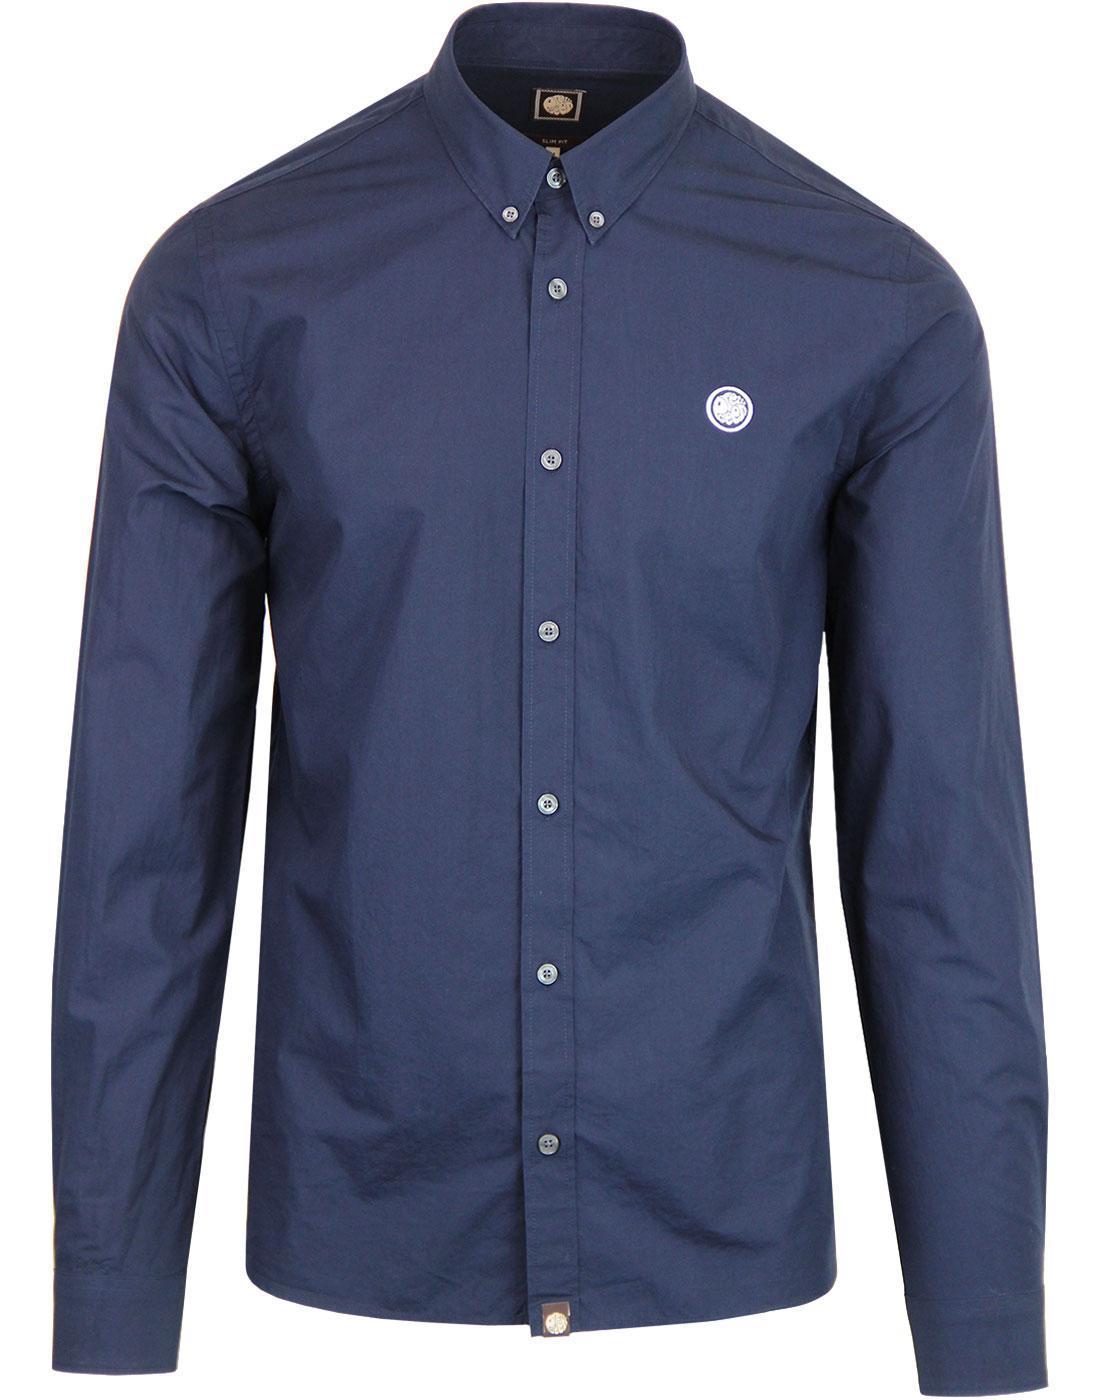 PRETTY GREEN Classic Mod Button Down Collar Shirt